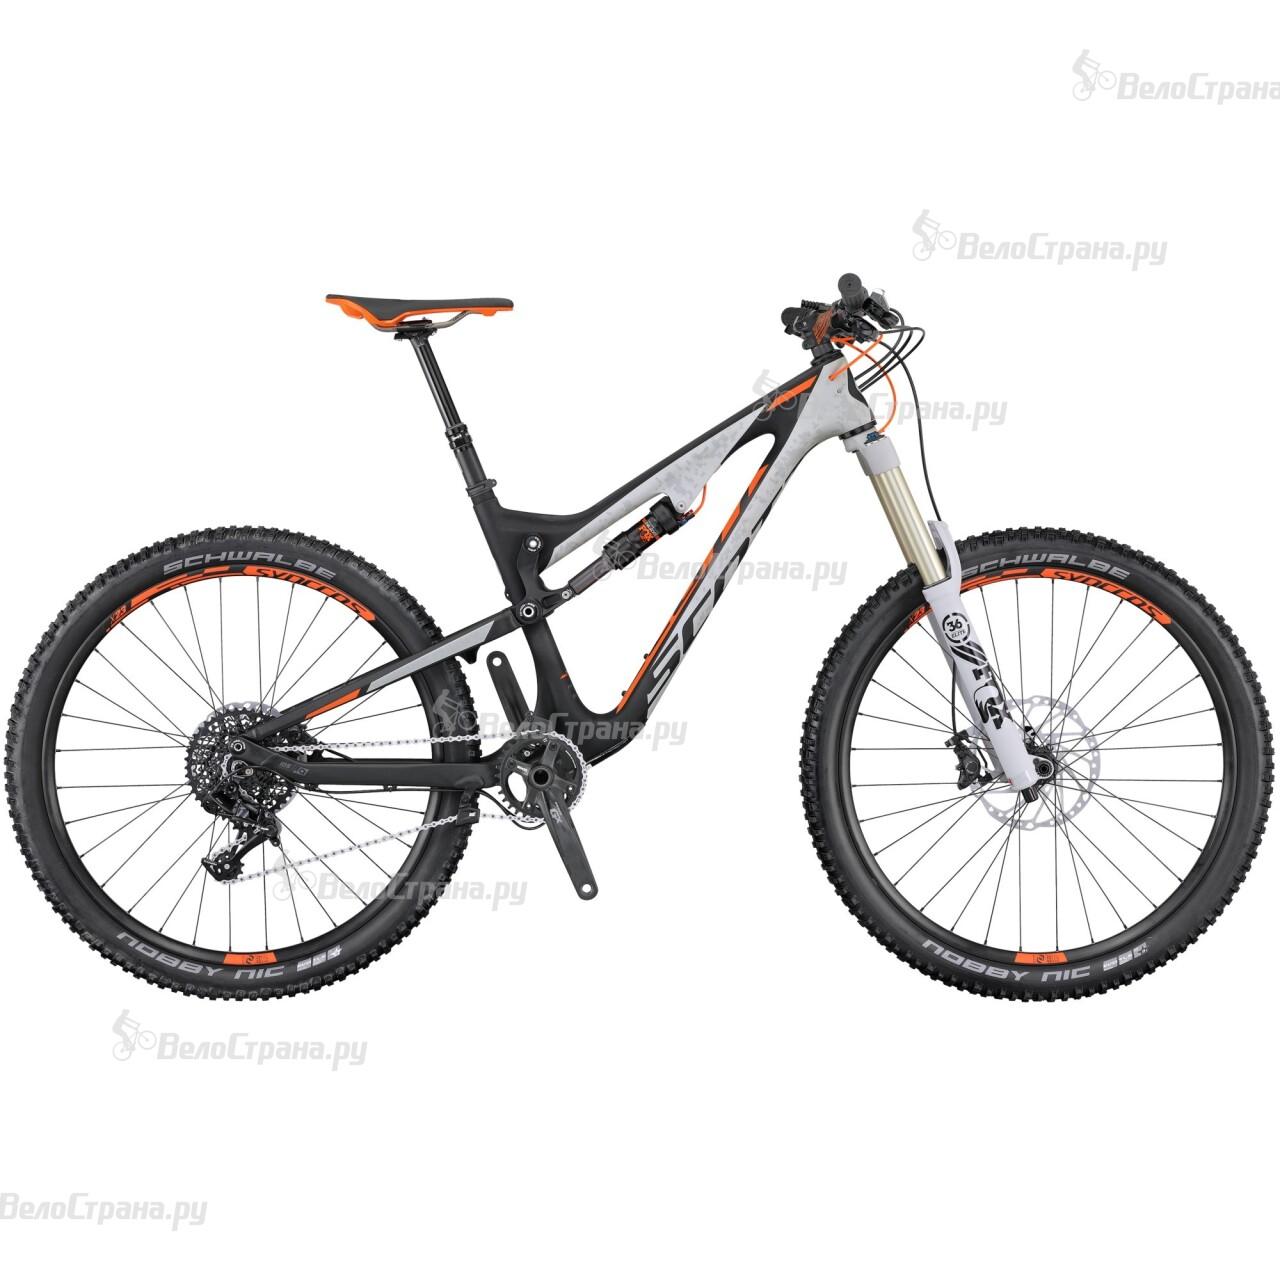 Велосипед Scott Genius LT 710 (2016) genius hs 300a silver